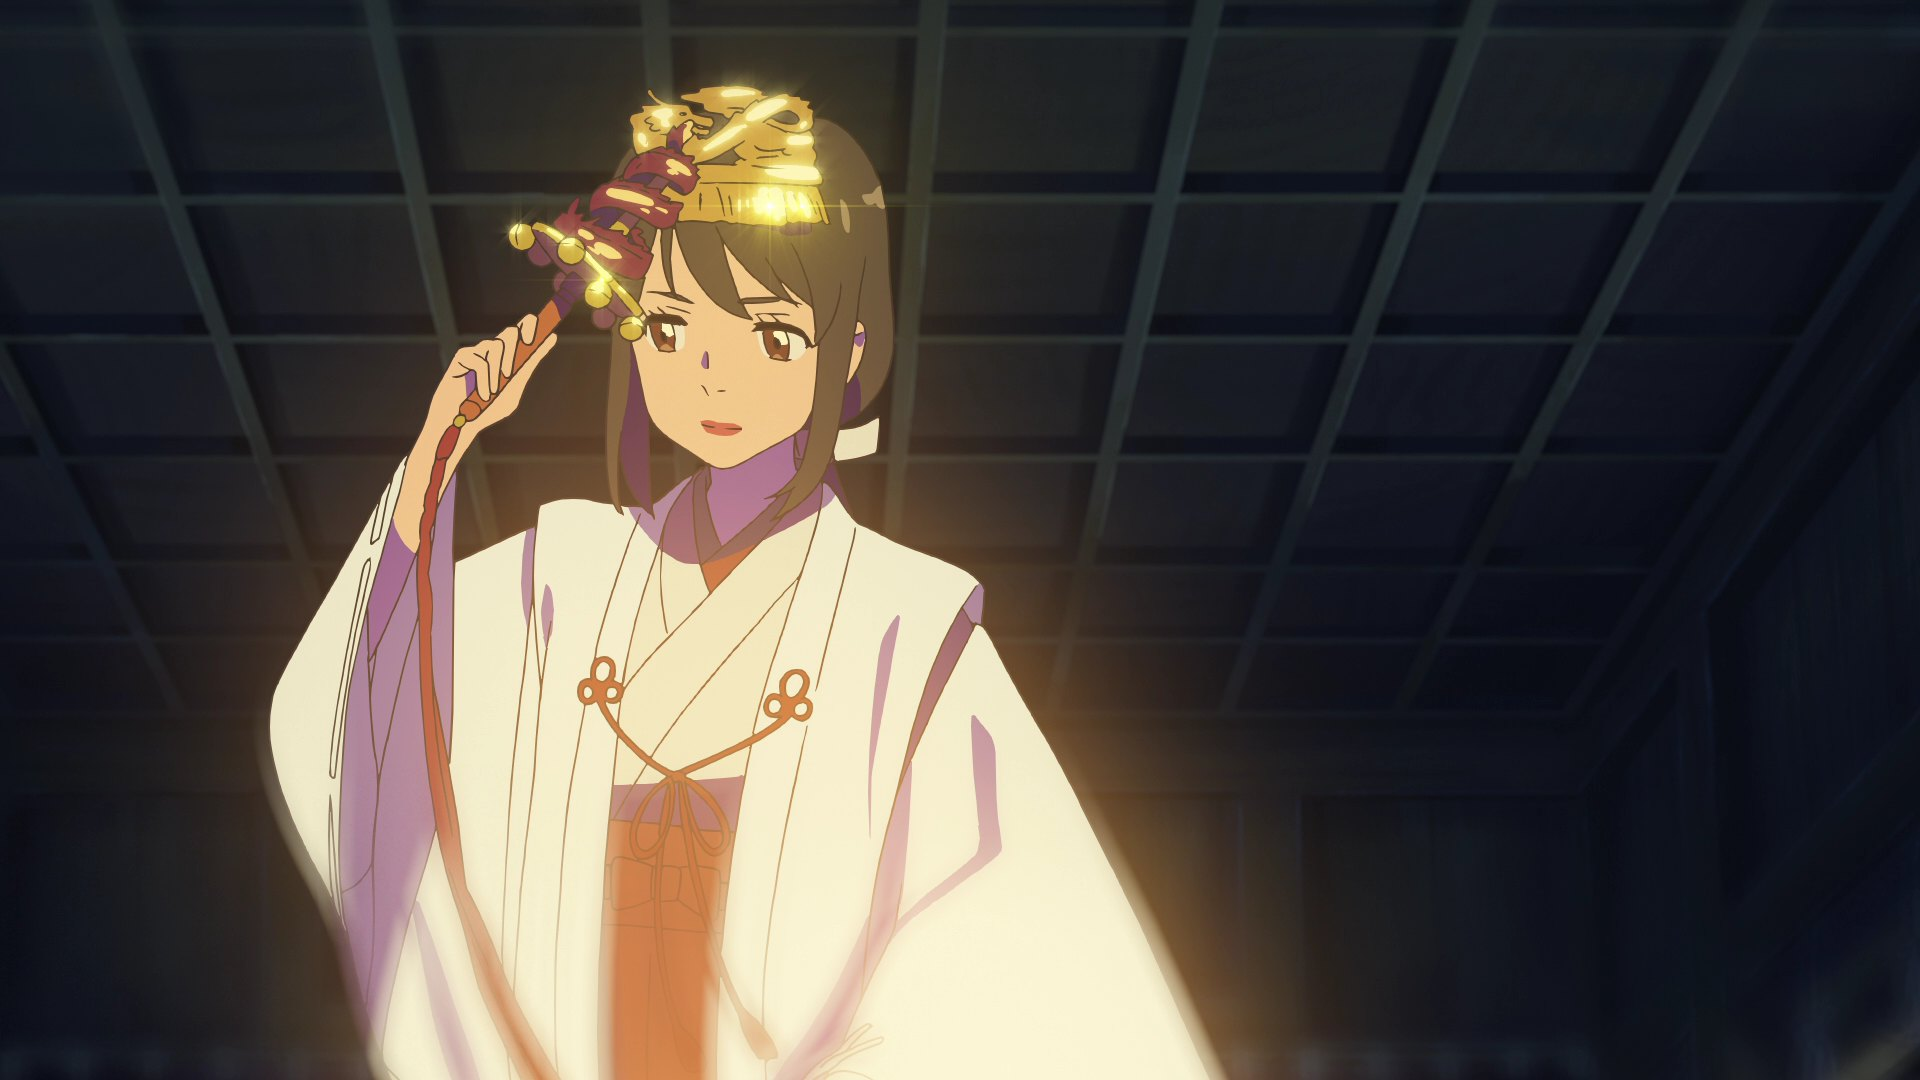 Kimi no Na wa. (2016) | Recenzja Anime | Rascal Blog